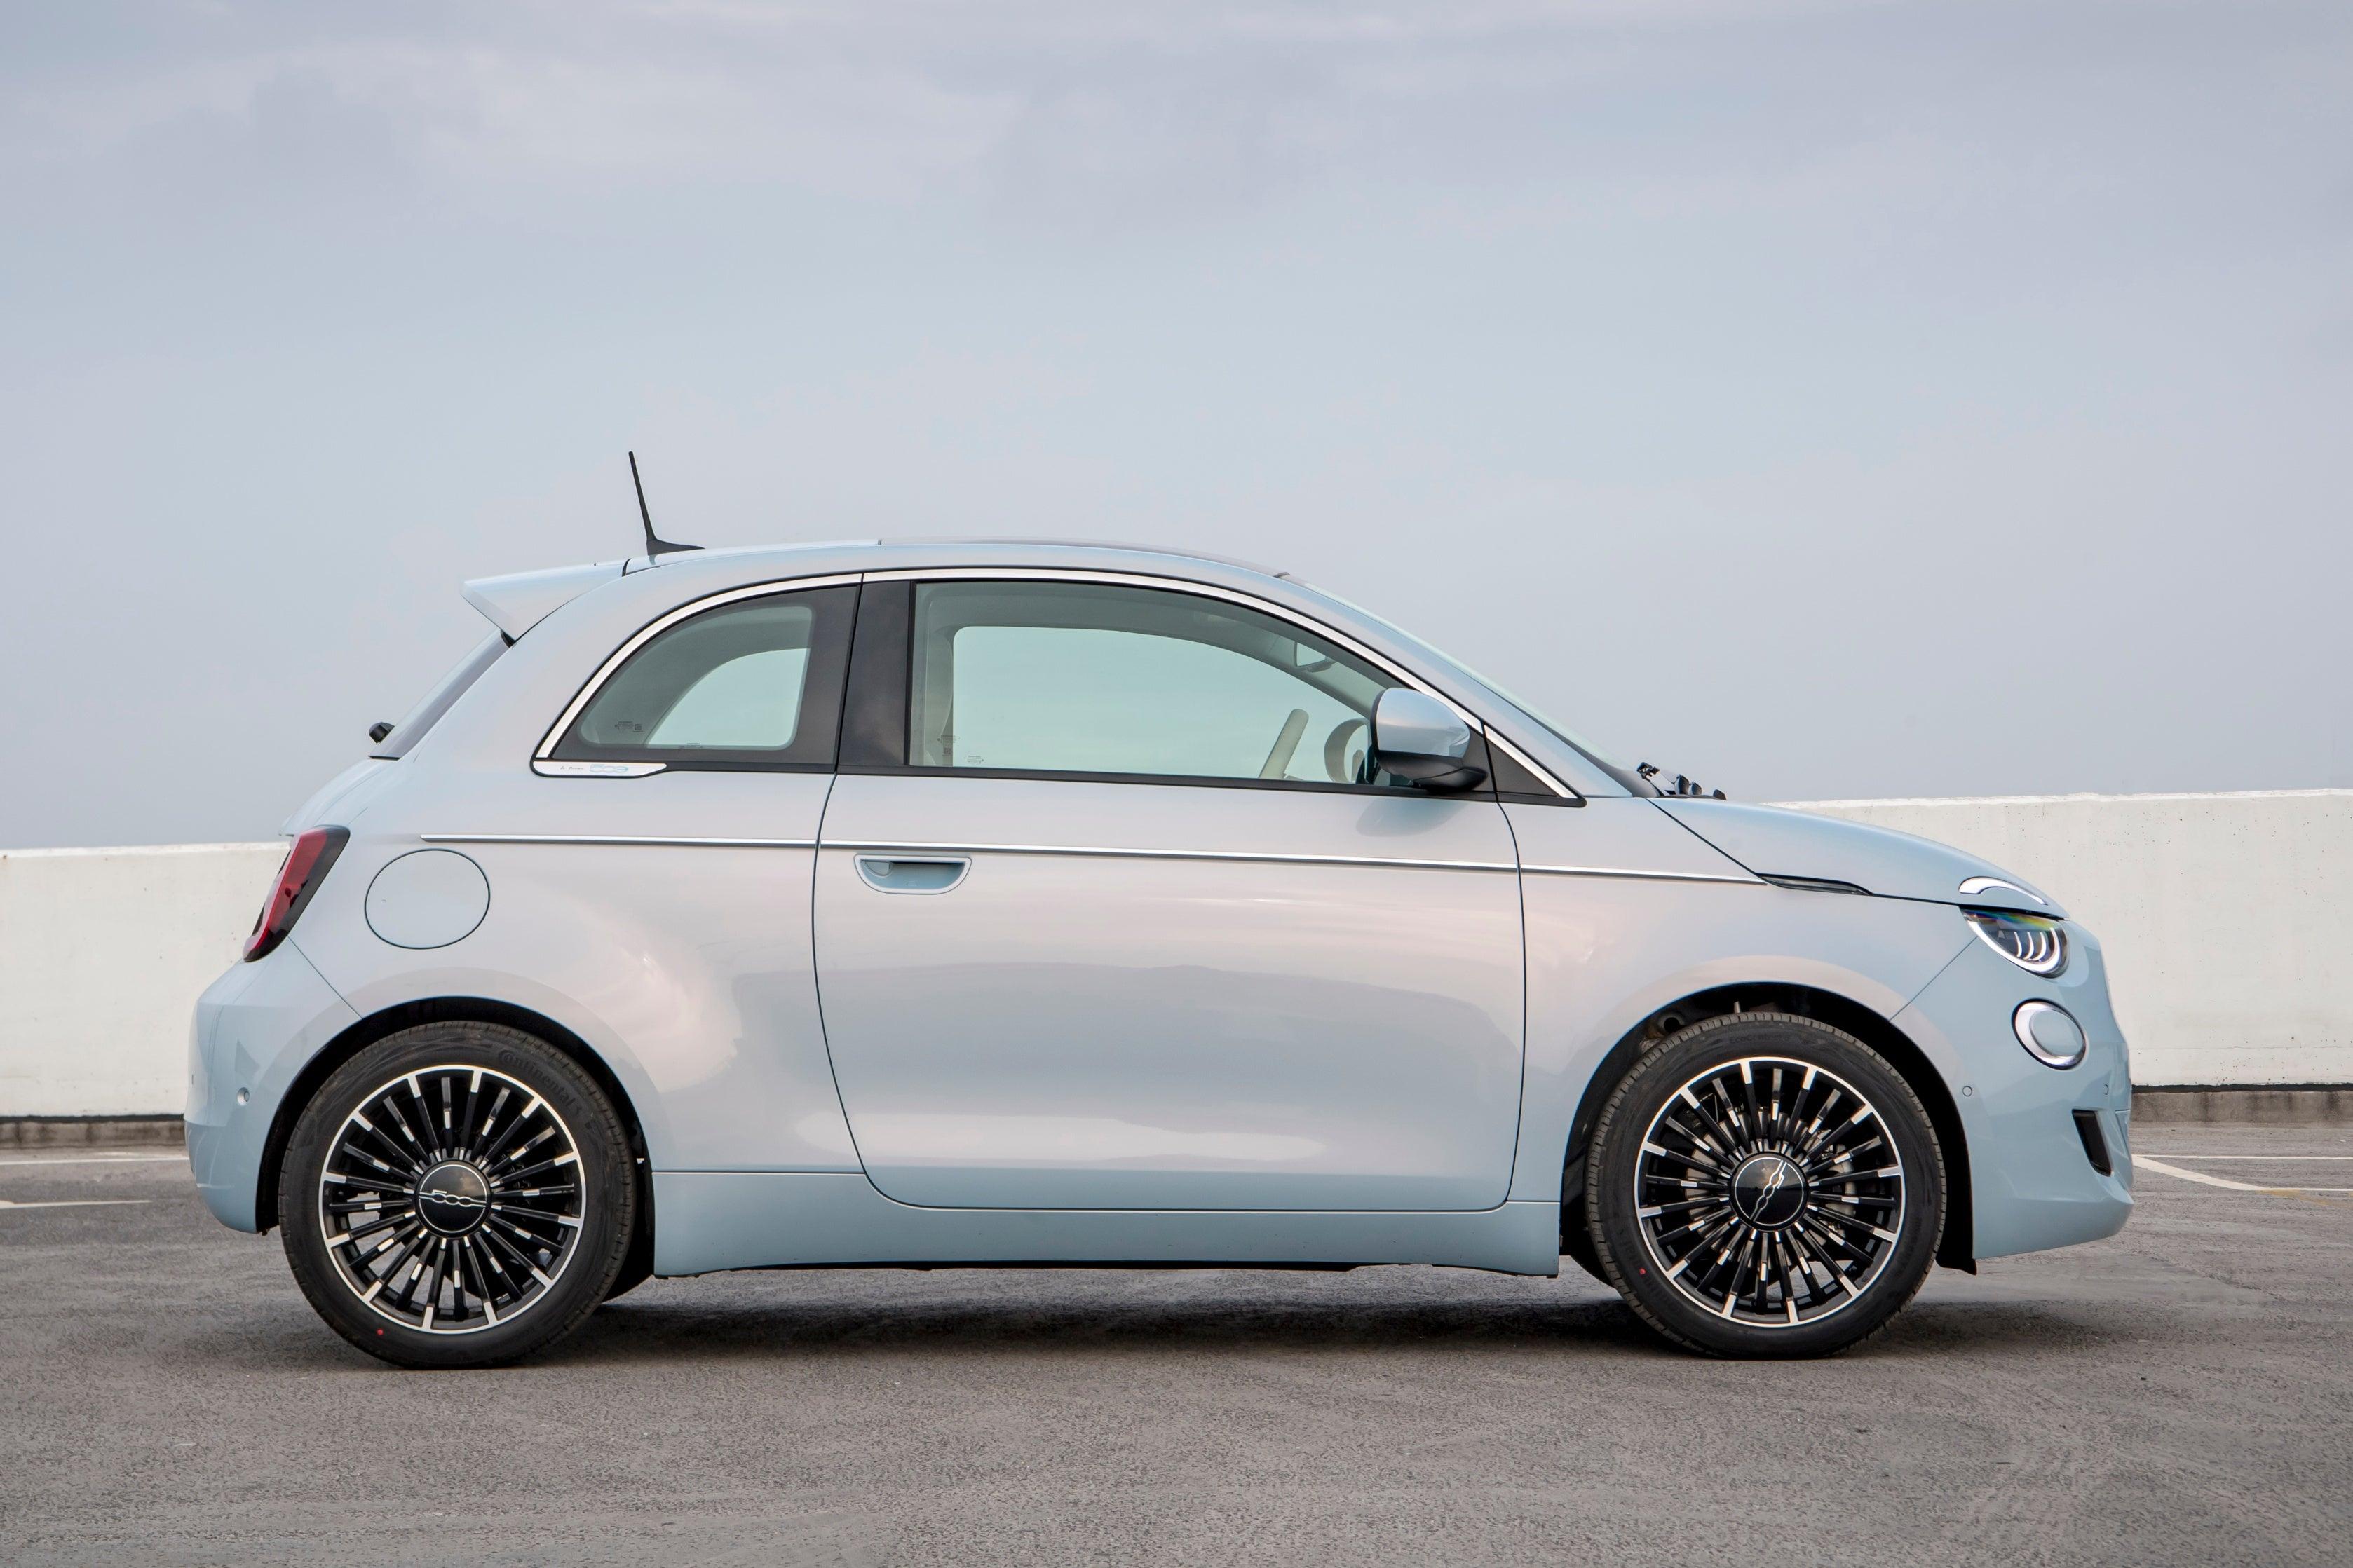 Fiat 500 Electric side